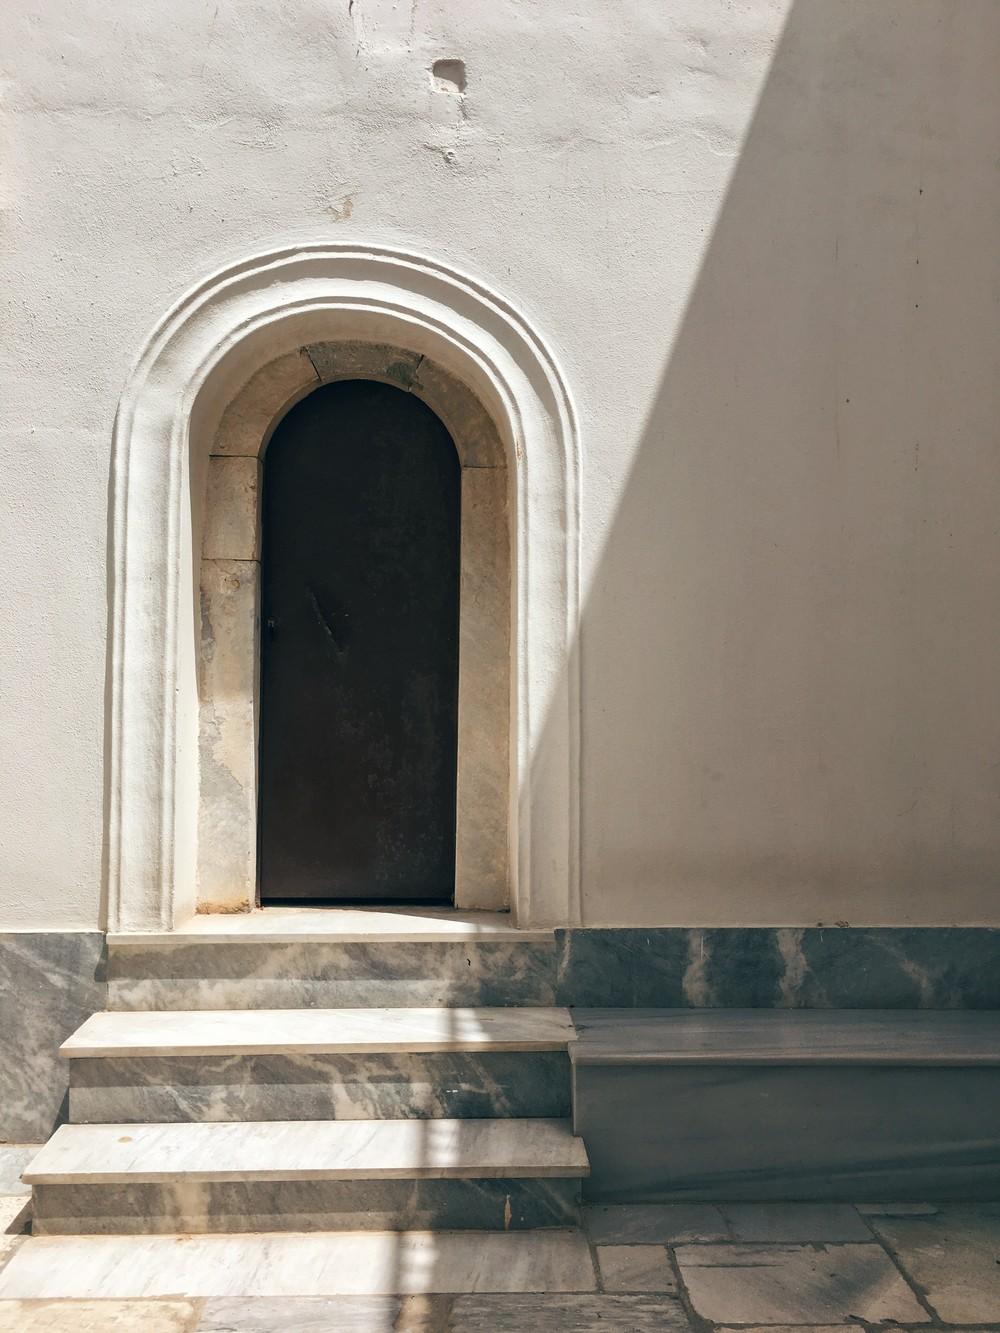 Panagia church, Tinos